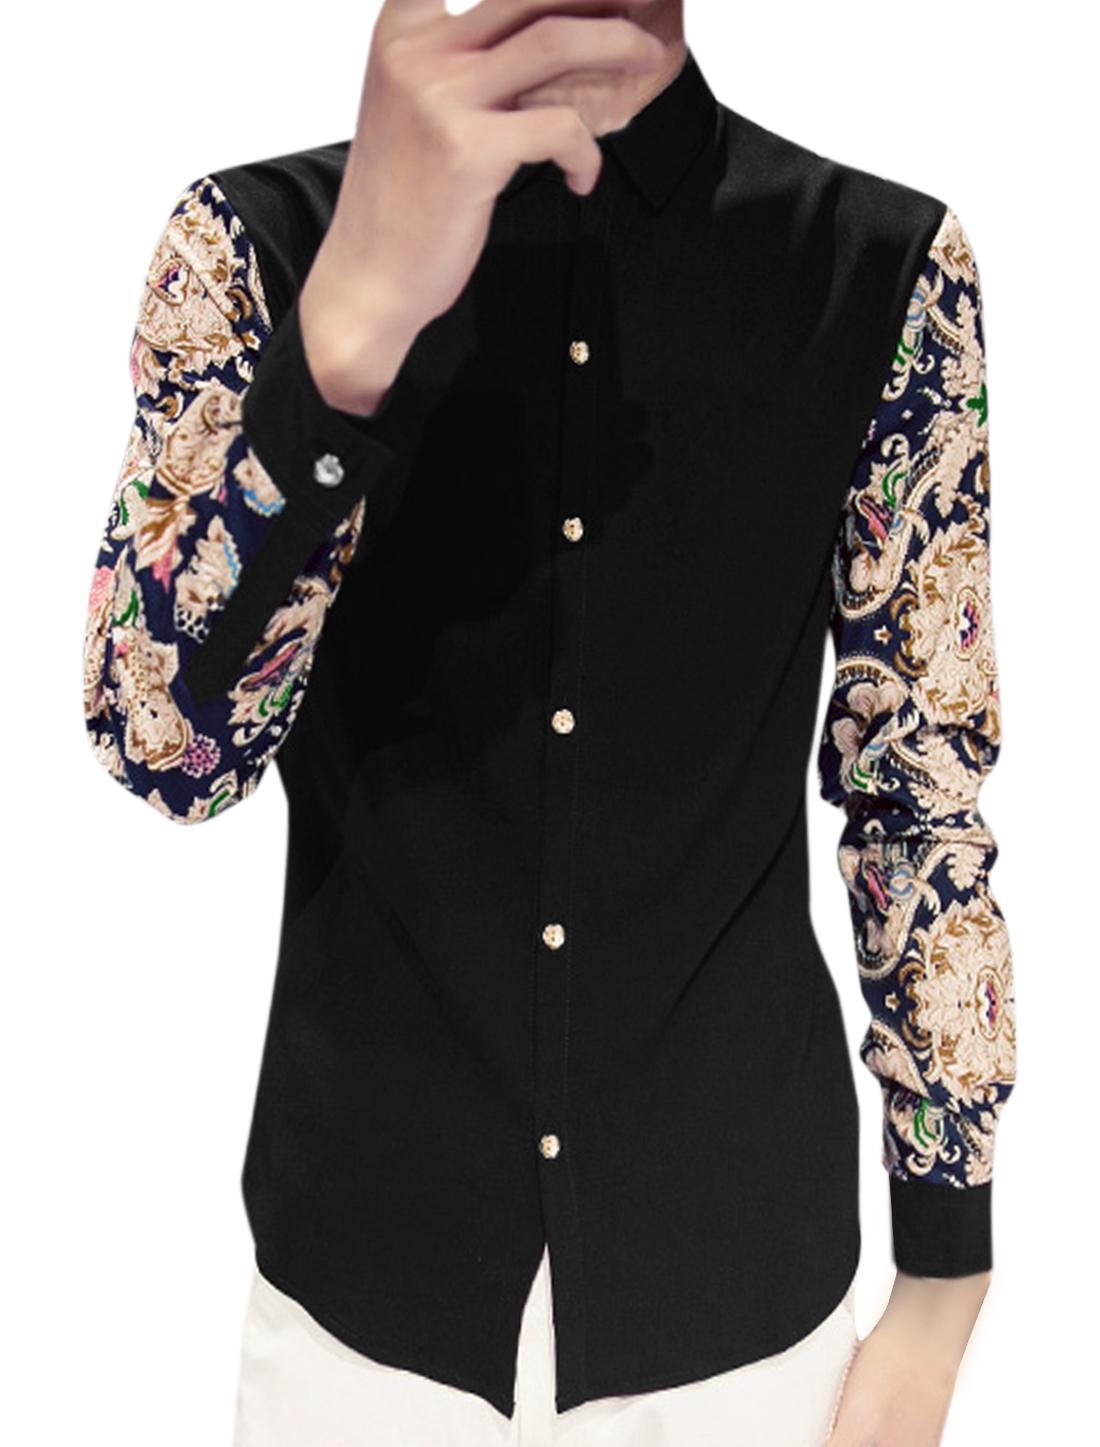 Men Long Sleeve Single Breasted Casual Shirt Black S